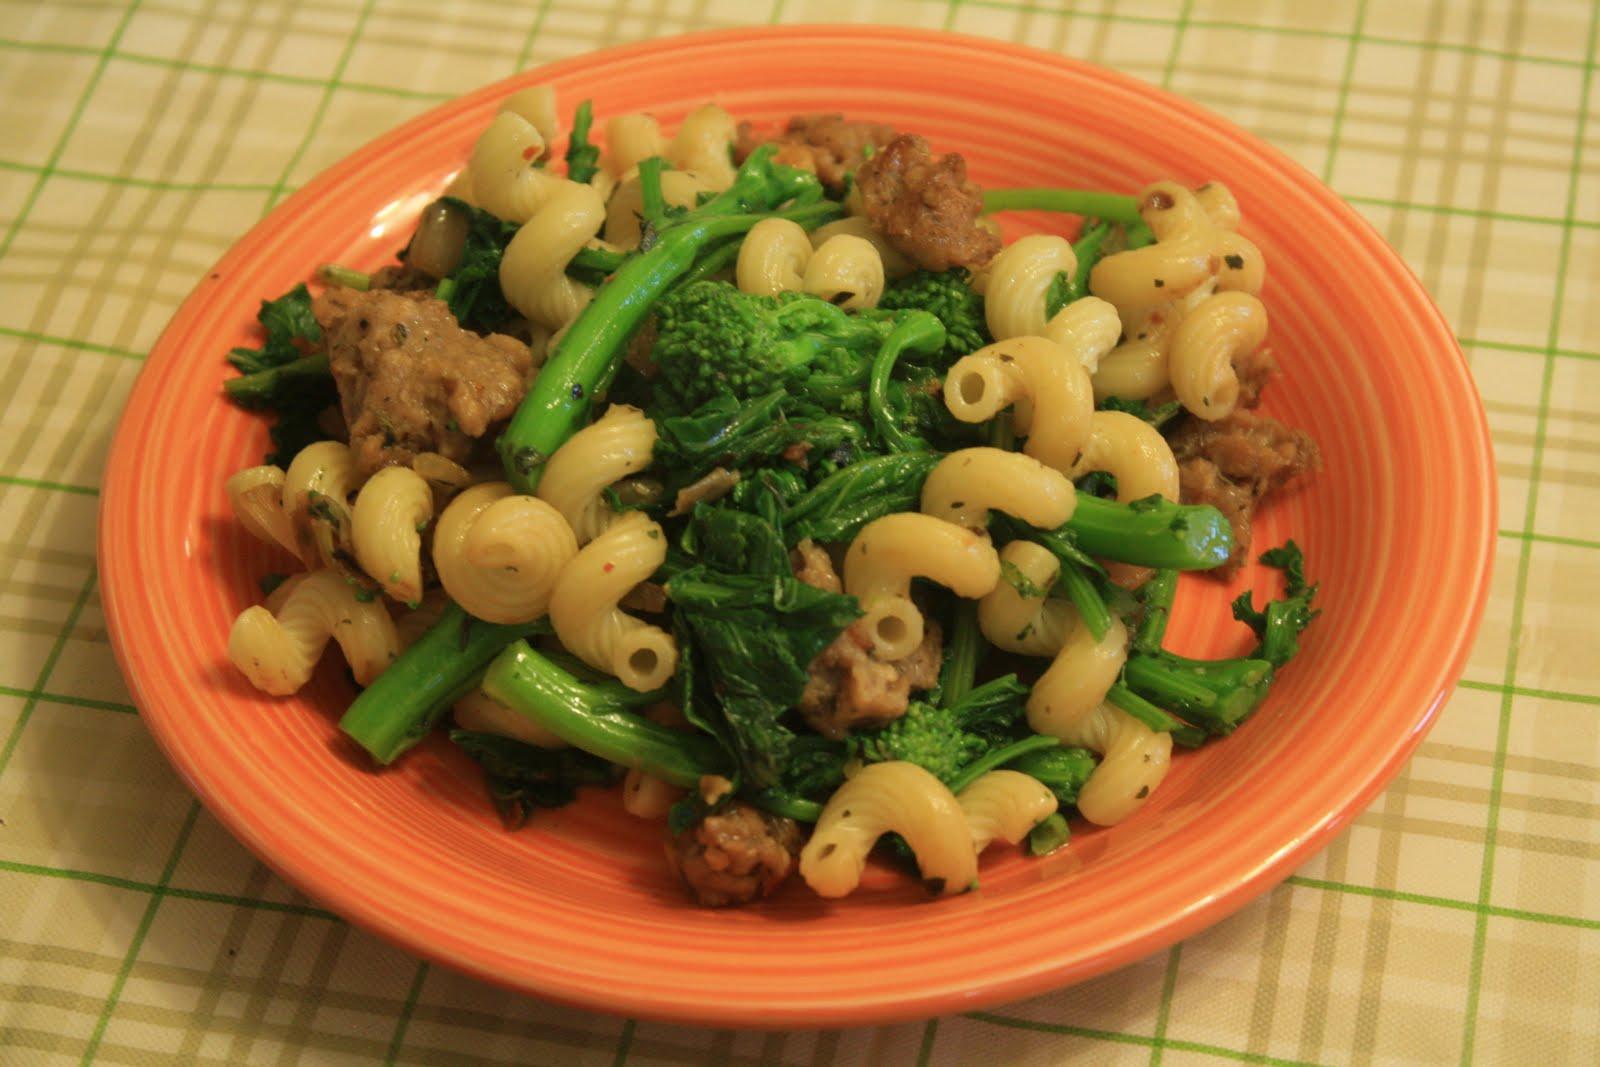 Joyfulgirl Makes: Pasta with Broccoli Rabe and Veggie Sausage